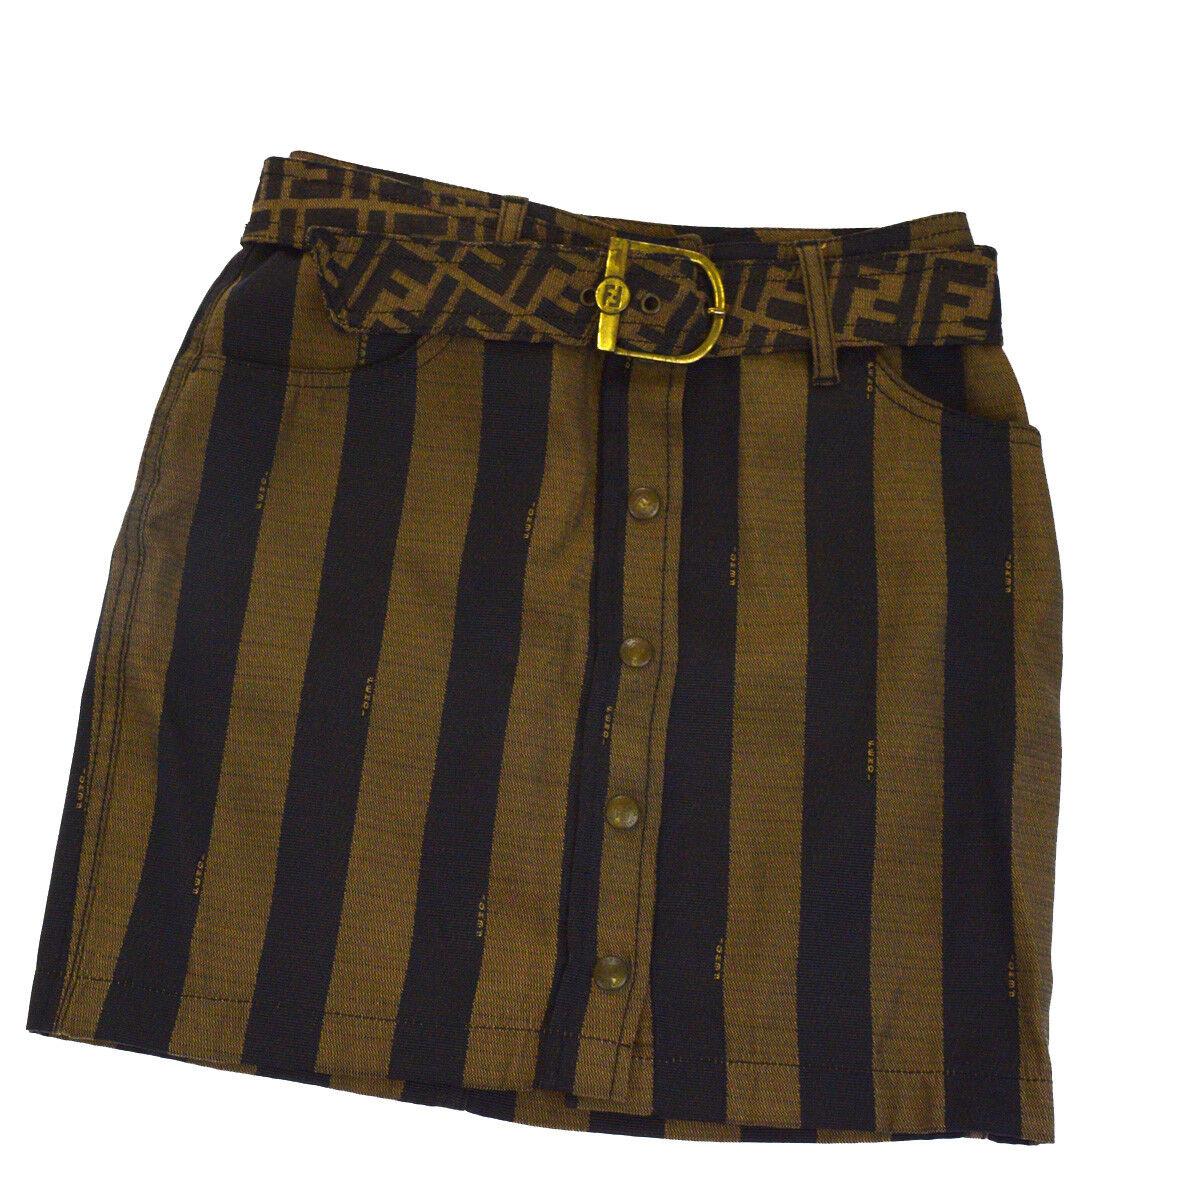 Authentic FENDI Pequin Zucca Aline Tight Skirt Polyester Cotton Brown 34E011